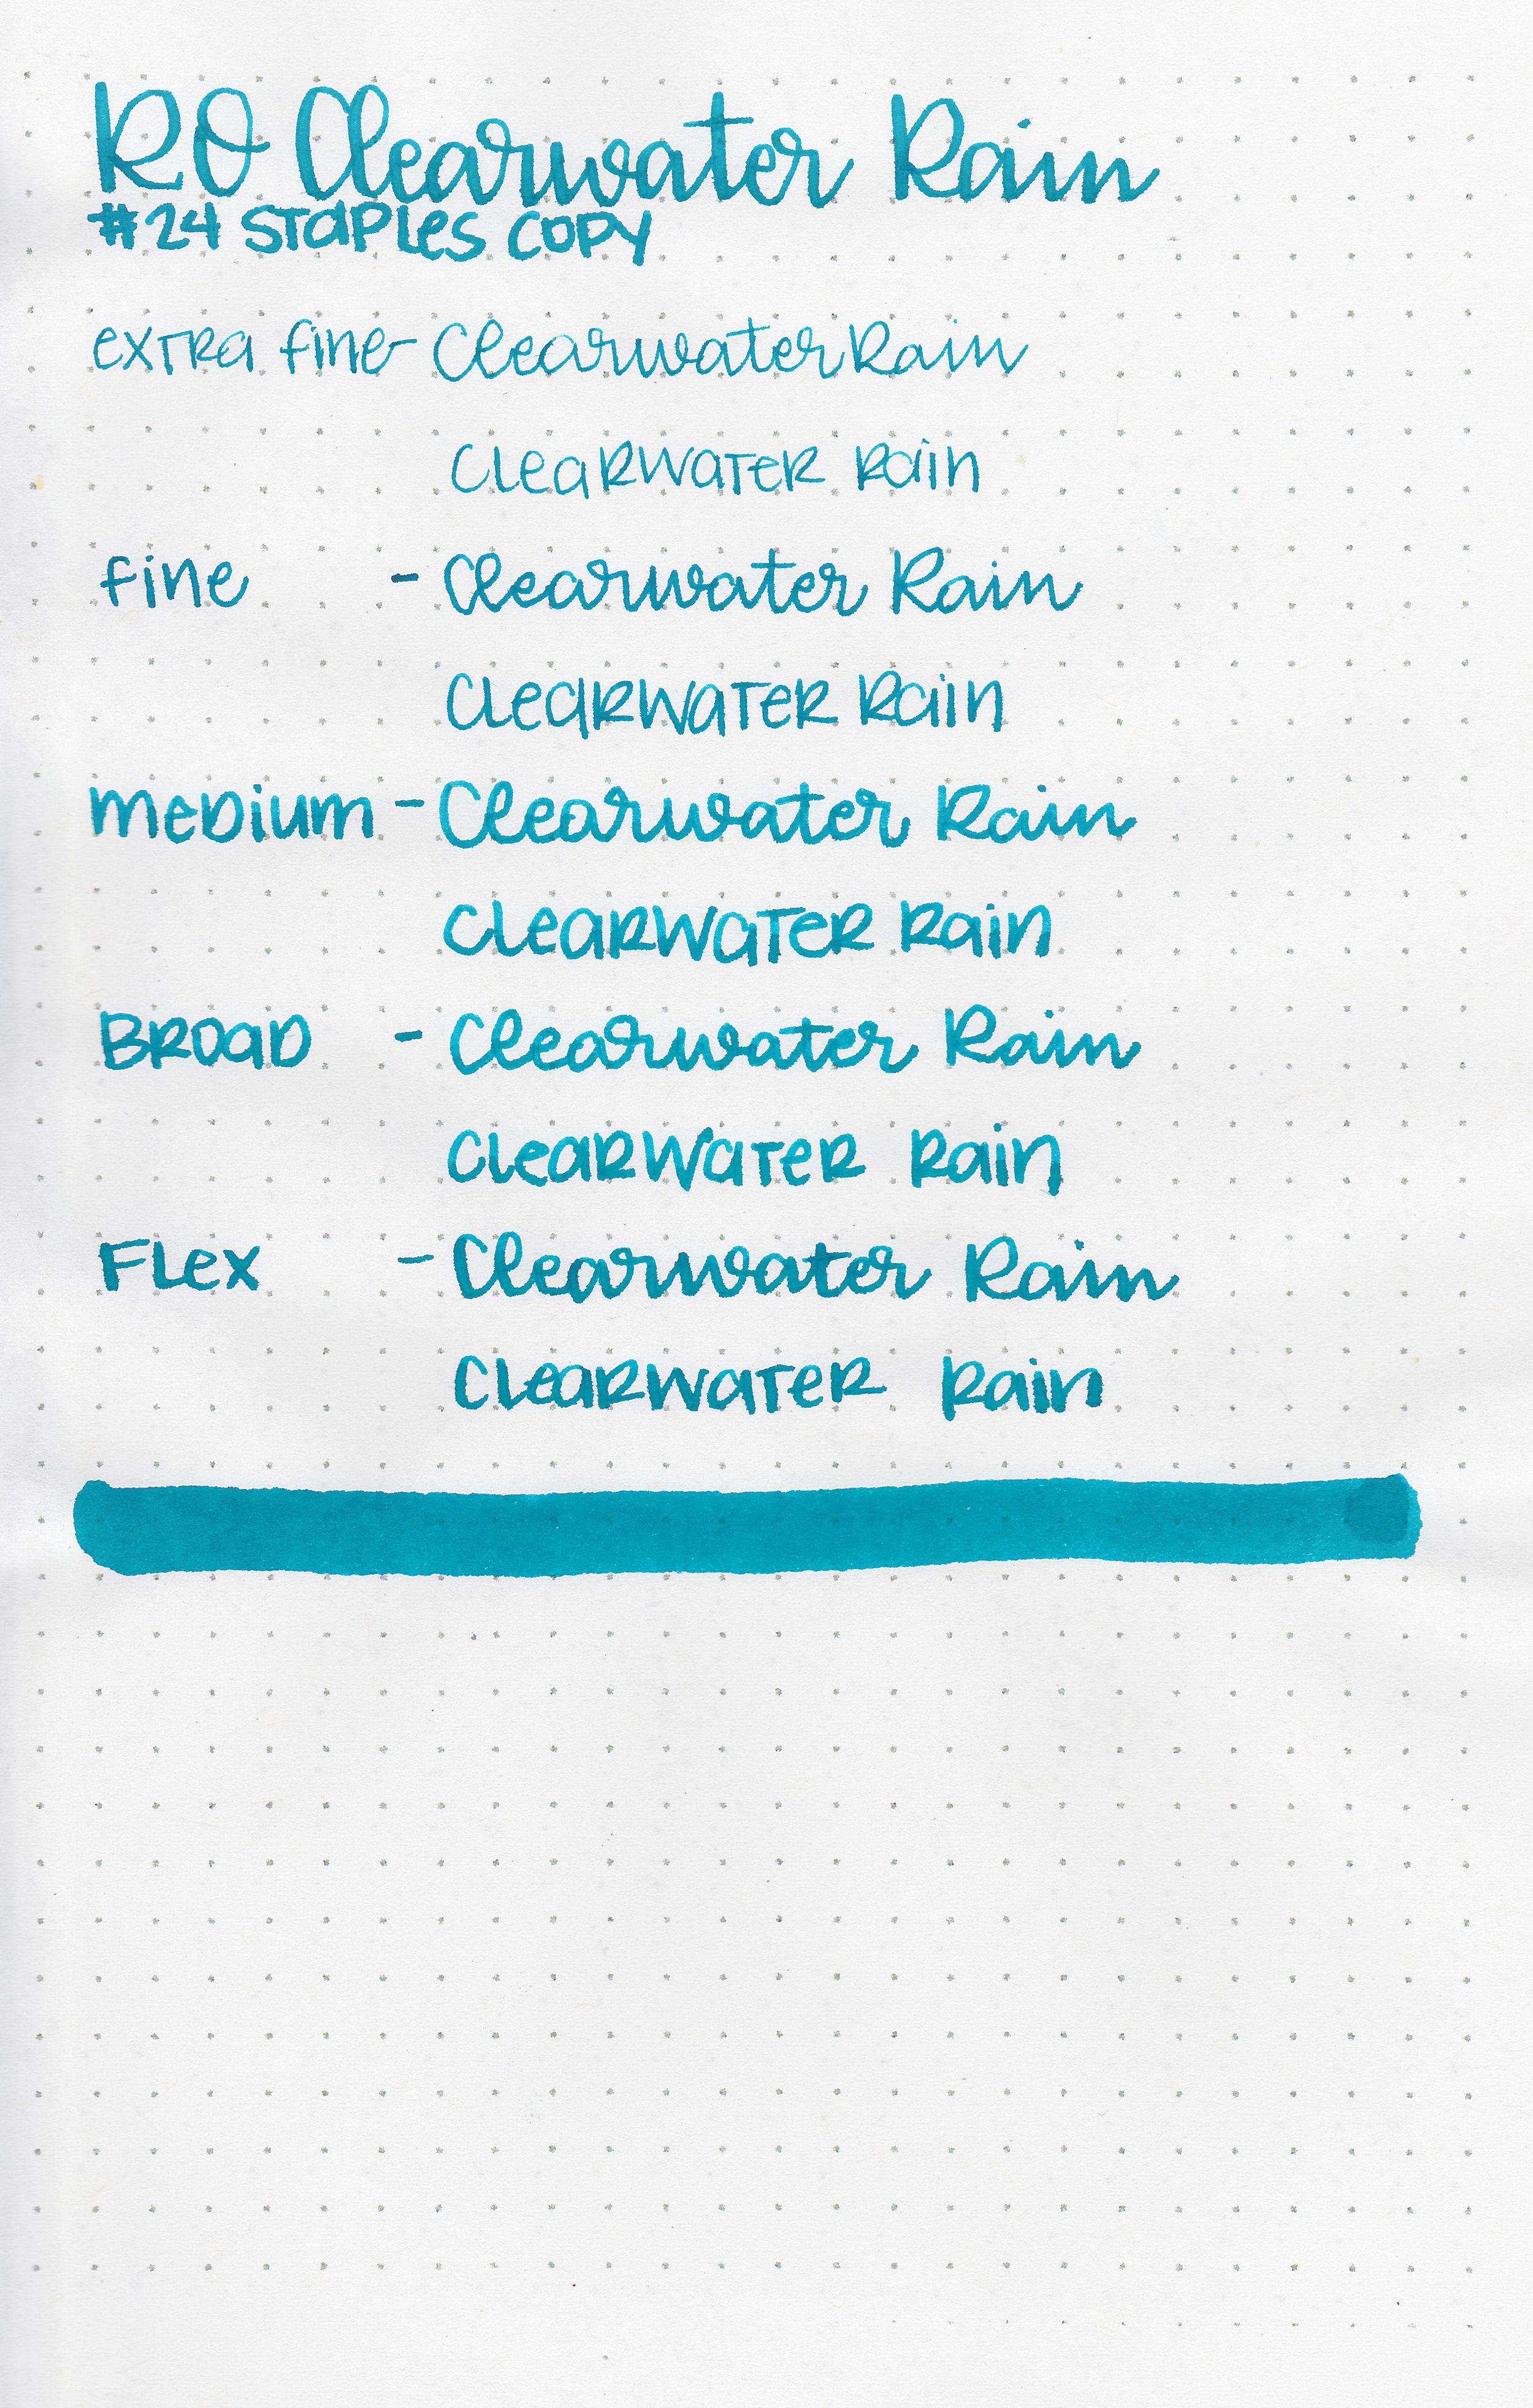 ro-clearwater-rain-14.jpg